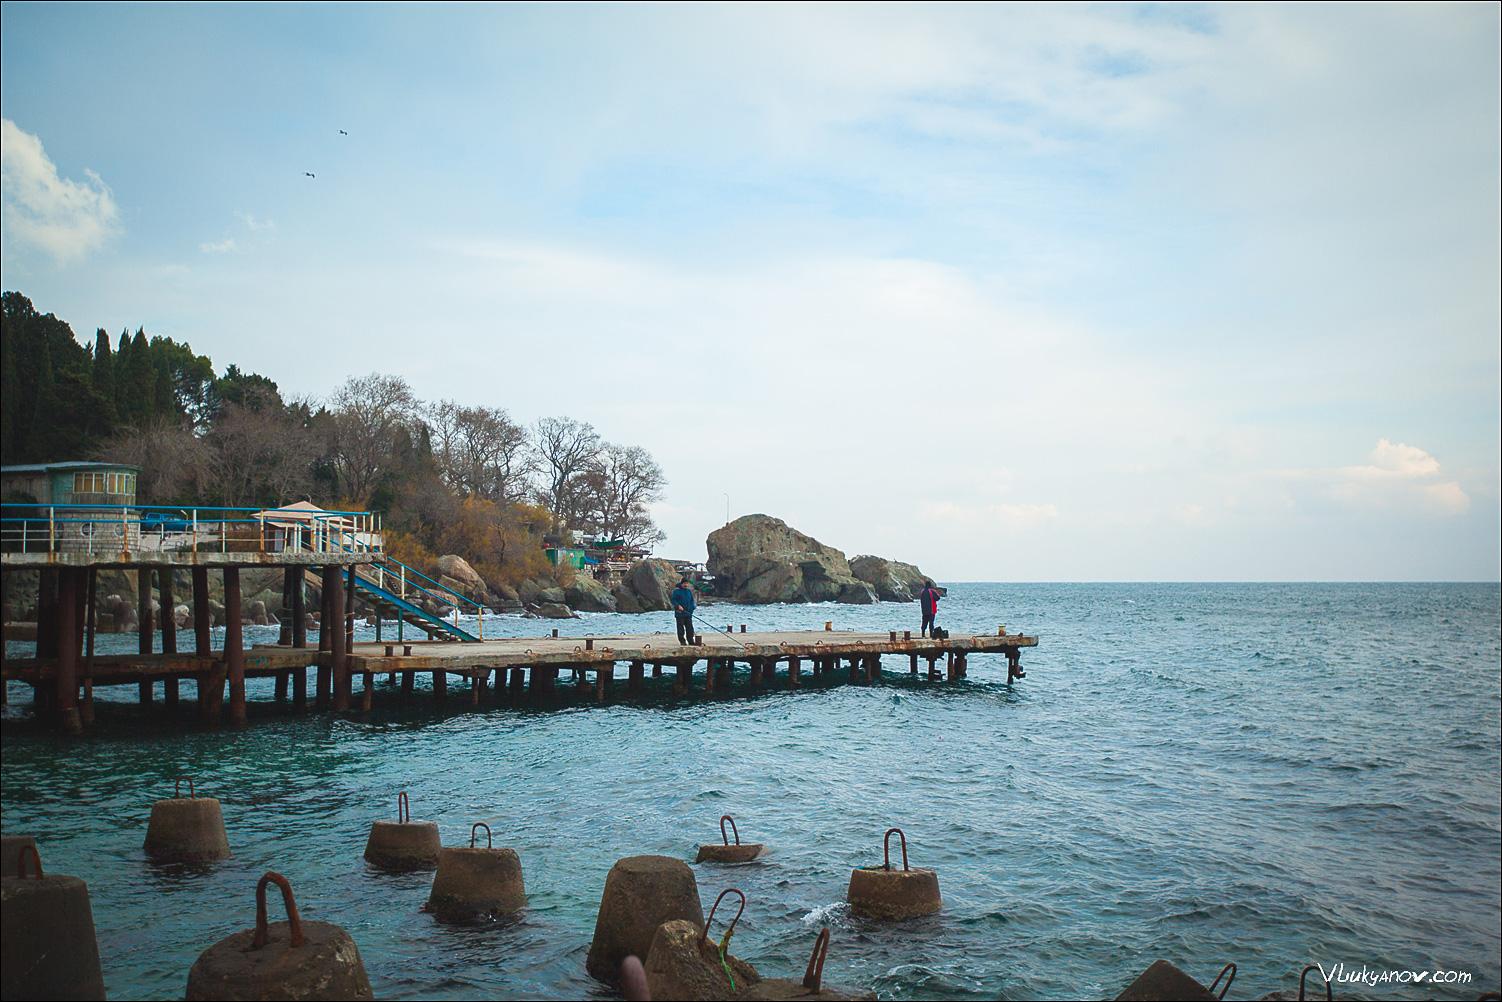 Фотограф, Москва, Владимир Лукьянов, Крым, Алупка, море